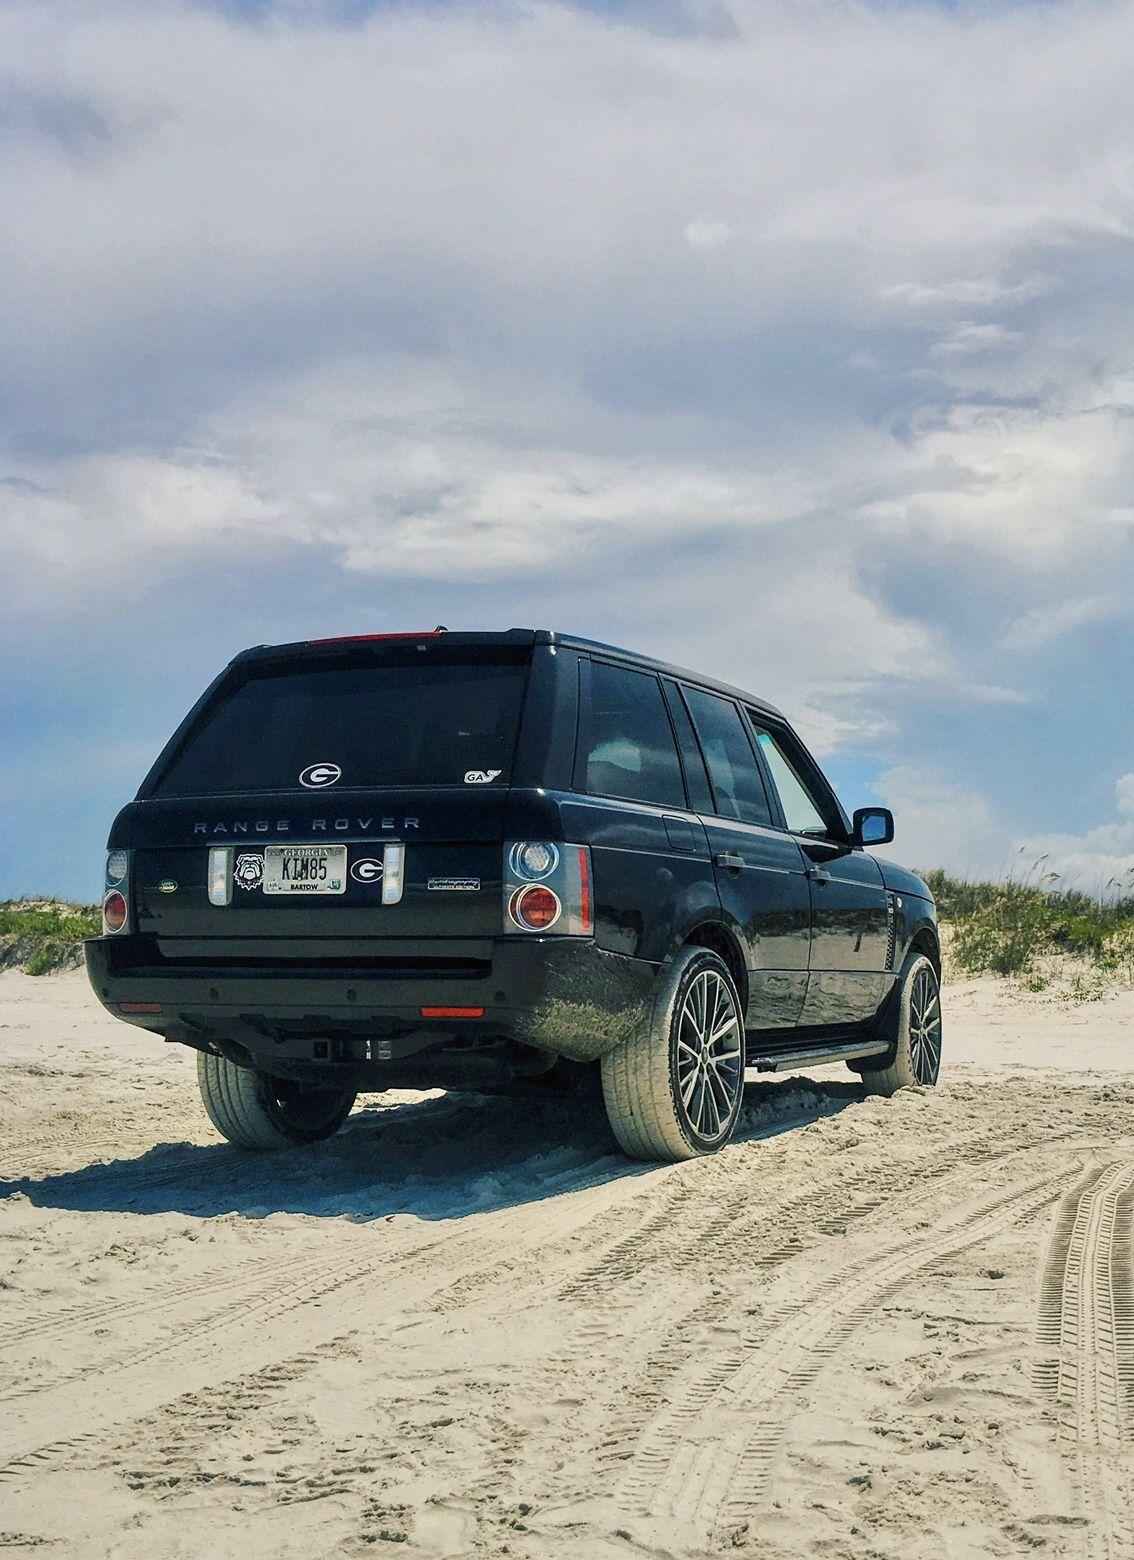 2007 L322 Range Rover Hse 22 Wheels Beach Wallpaper Range Rover Supercharged Range Rover Range Rover Hse